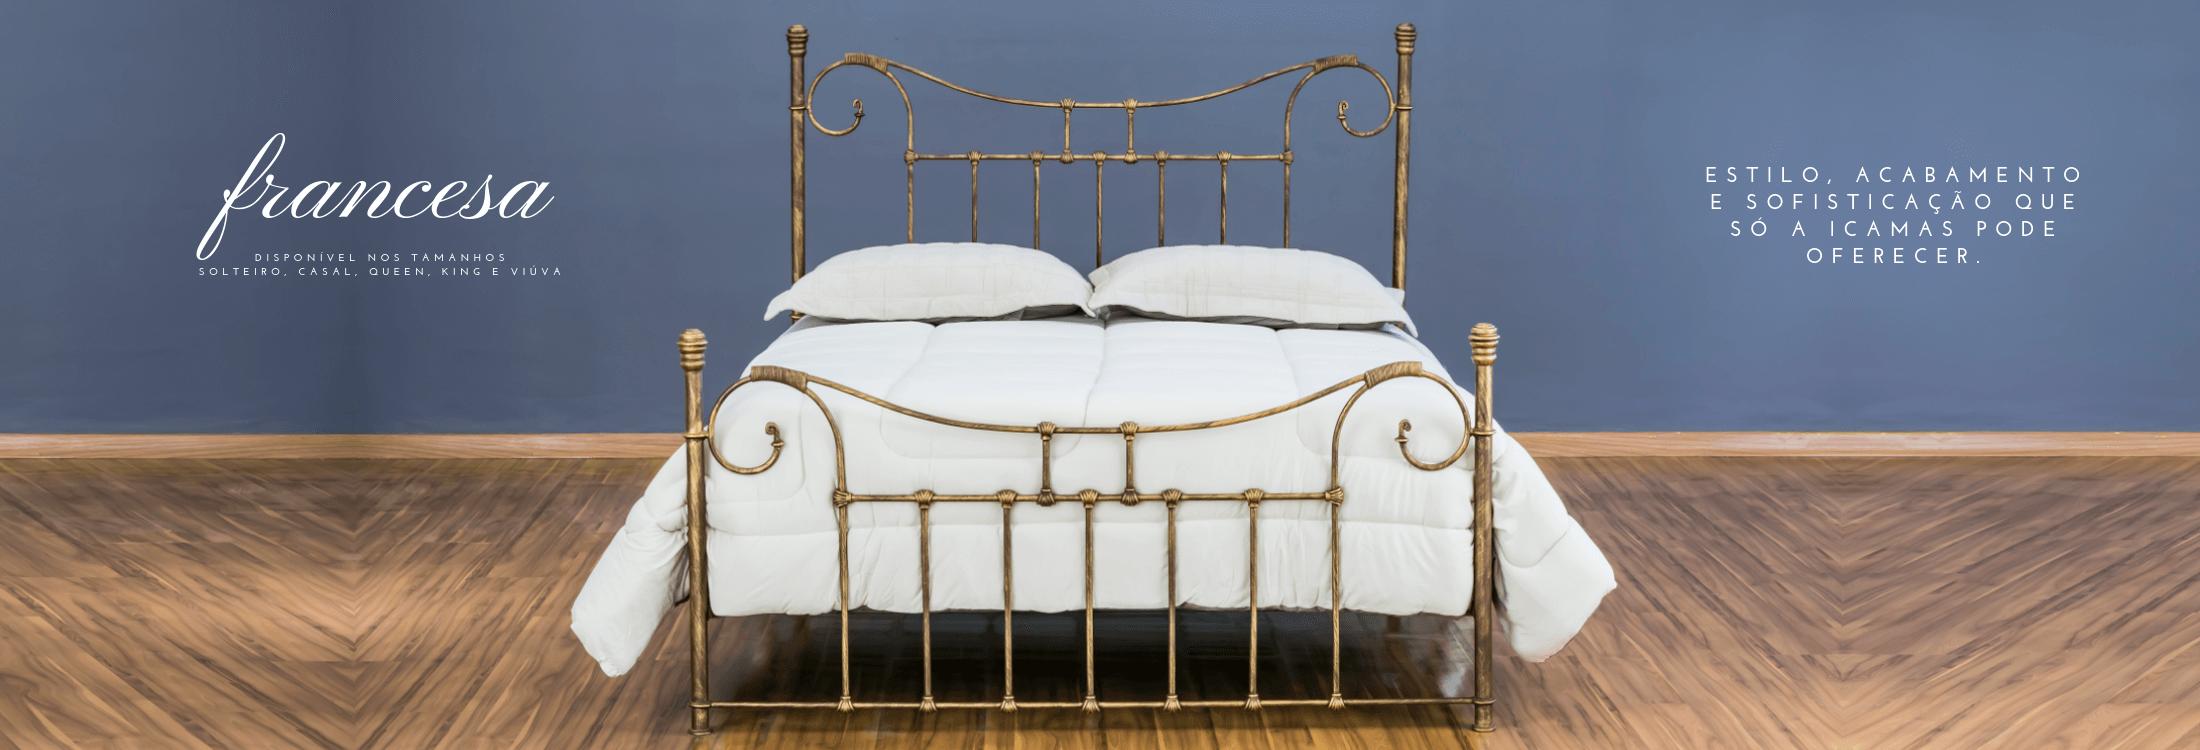 cama de ferro francesa